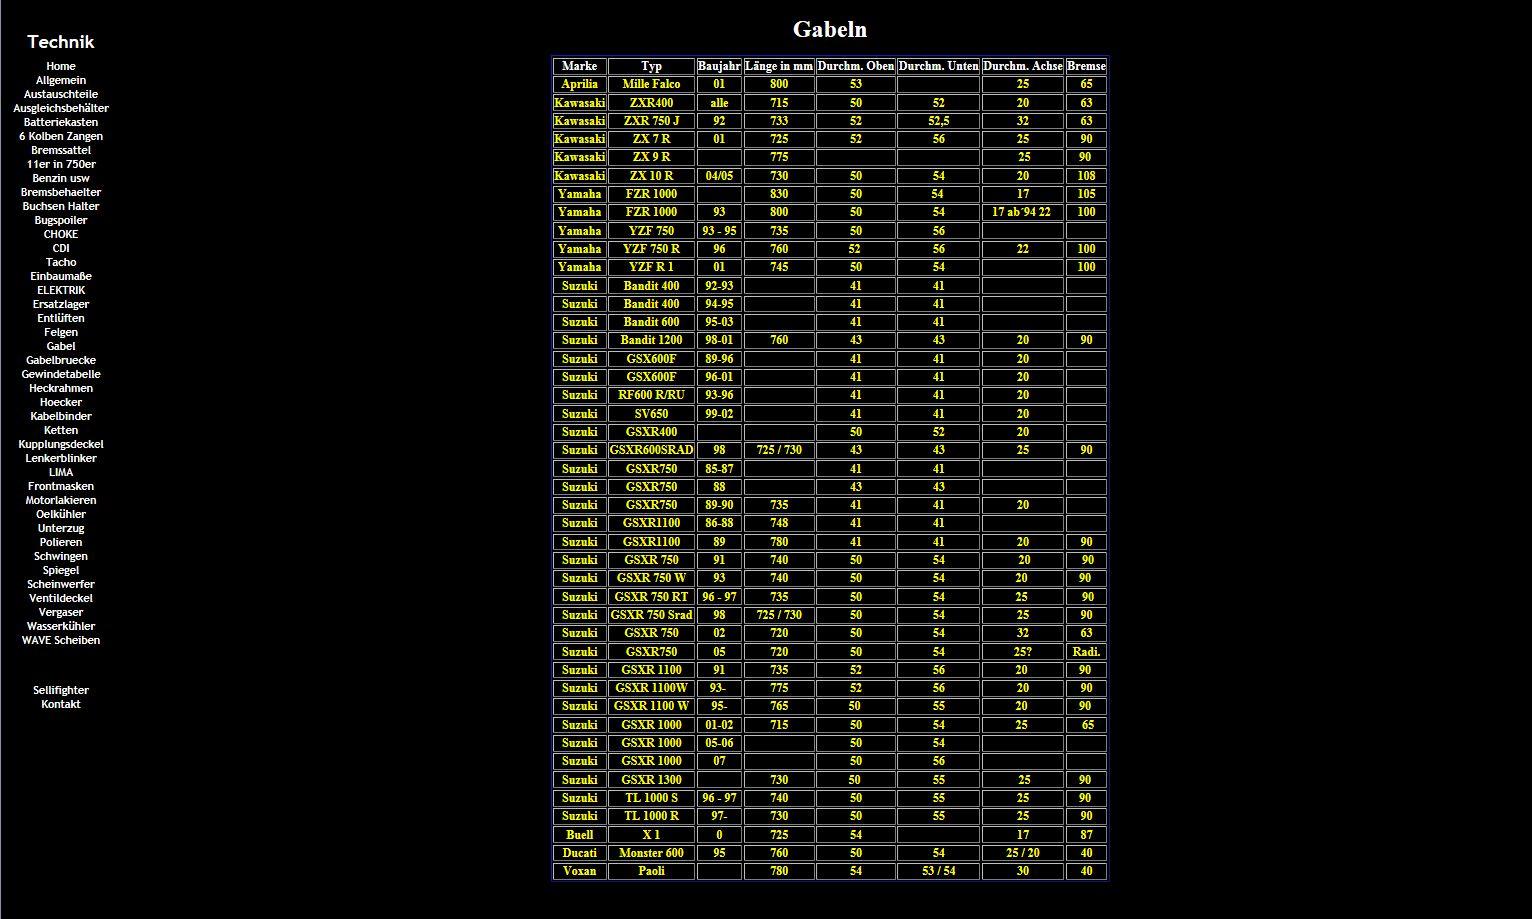 1980 z1r front end conversion - Page 2 - KZRider Forum - KZRider ...